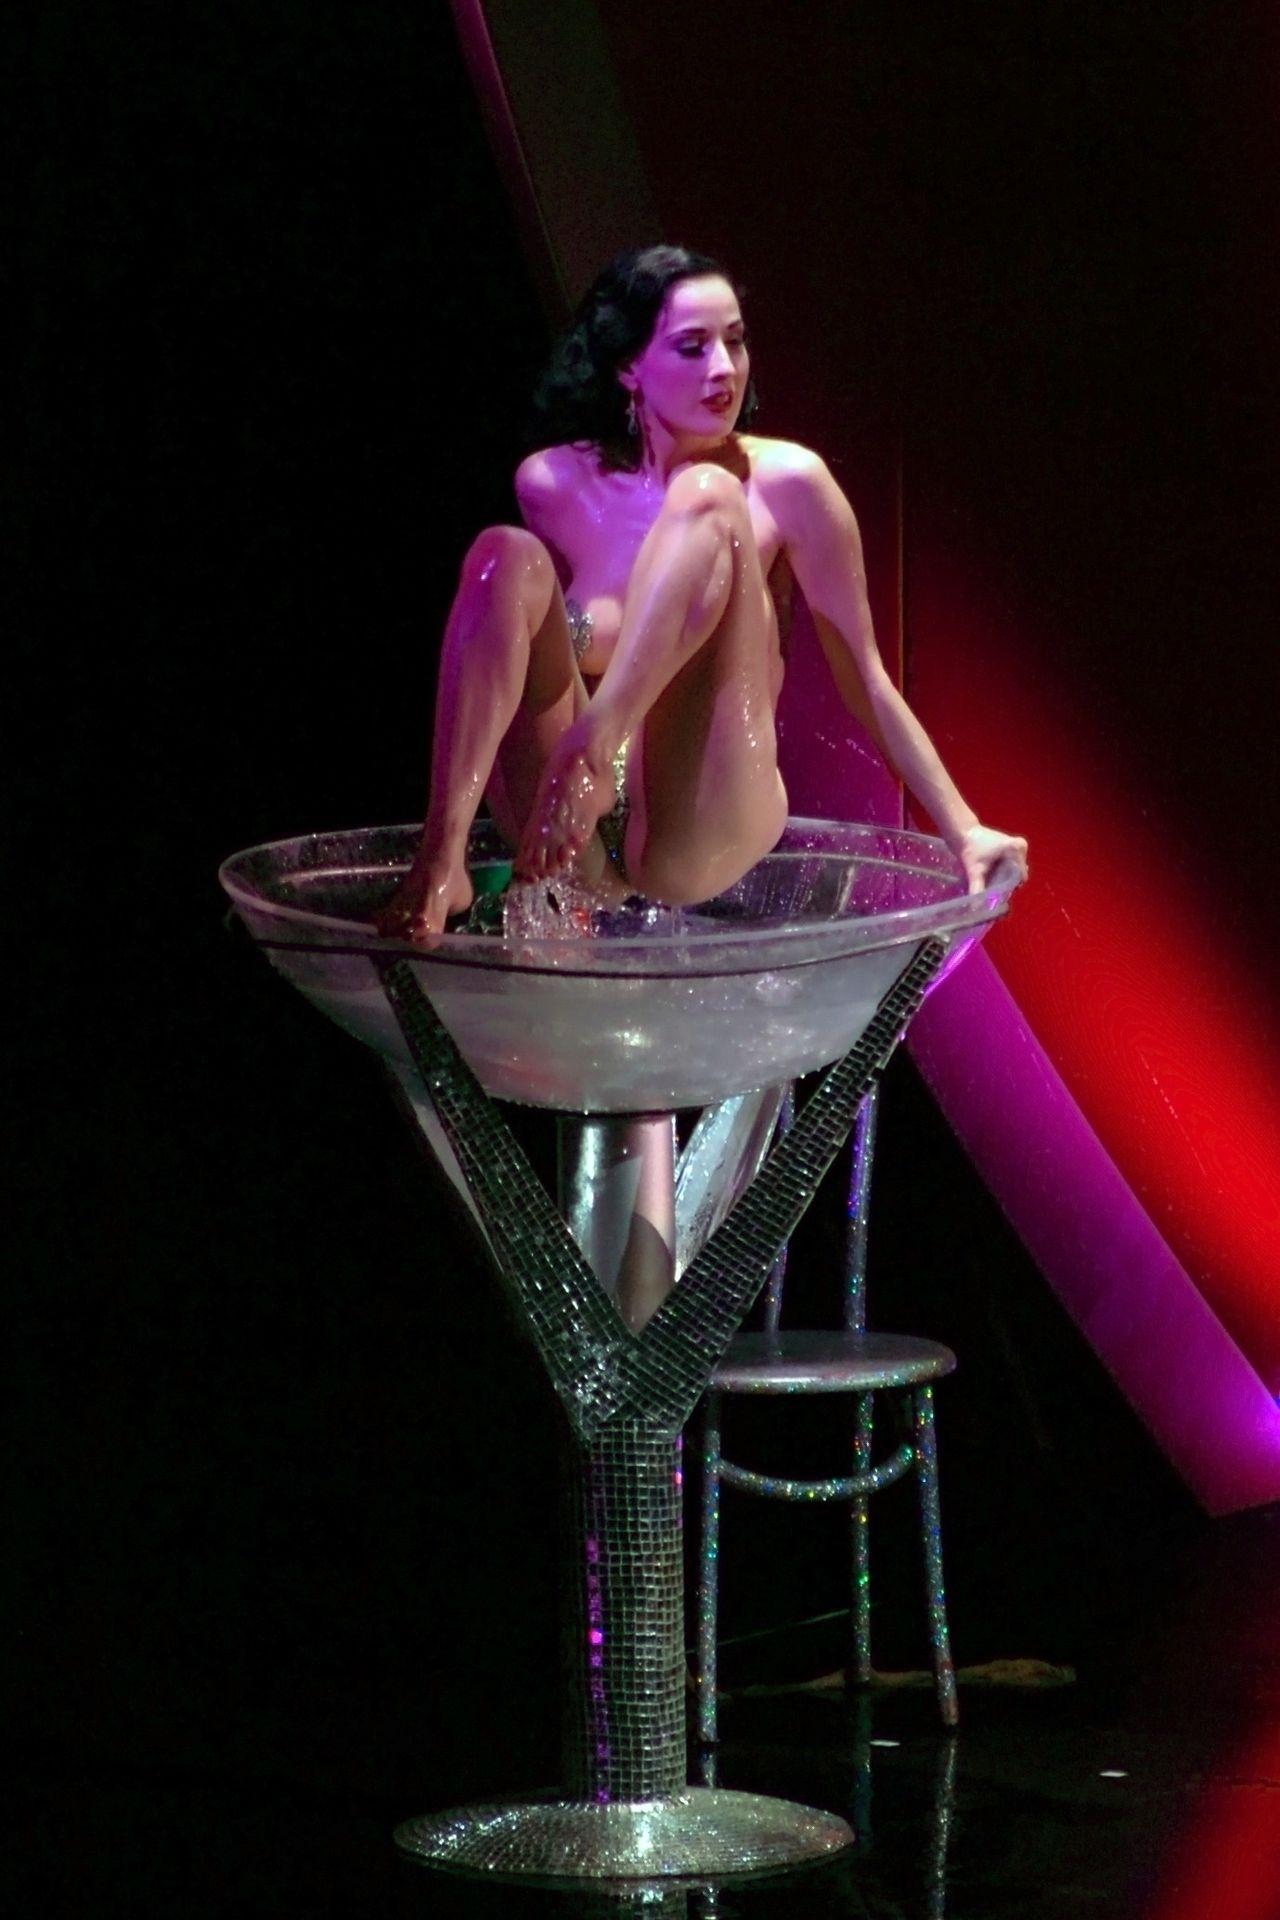 Dita Von Teese Performs At Erotica 06 In London 0048